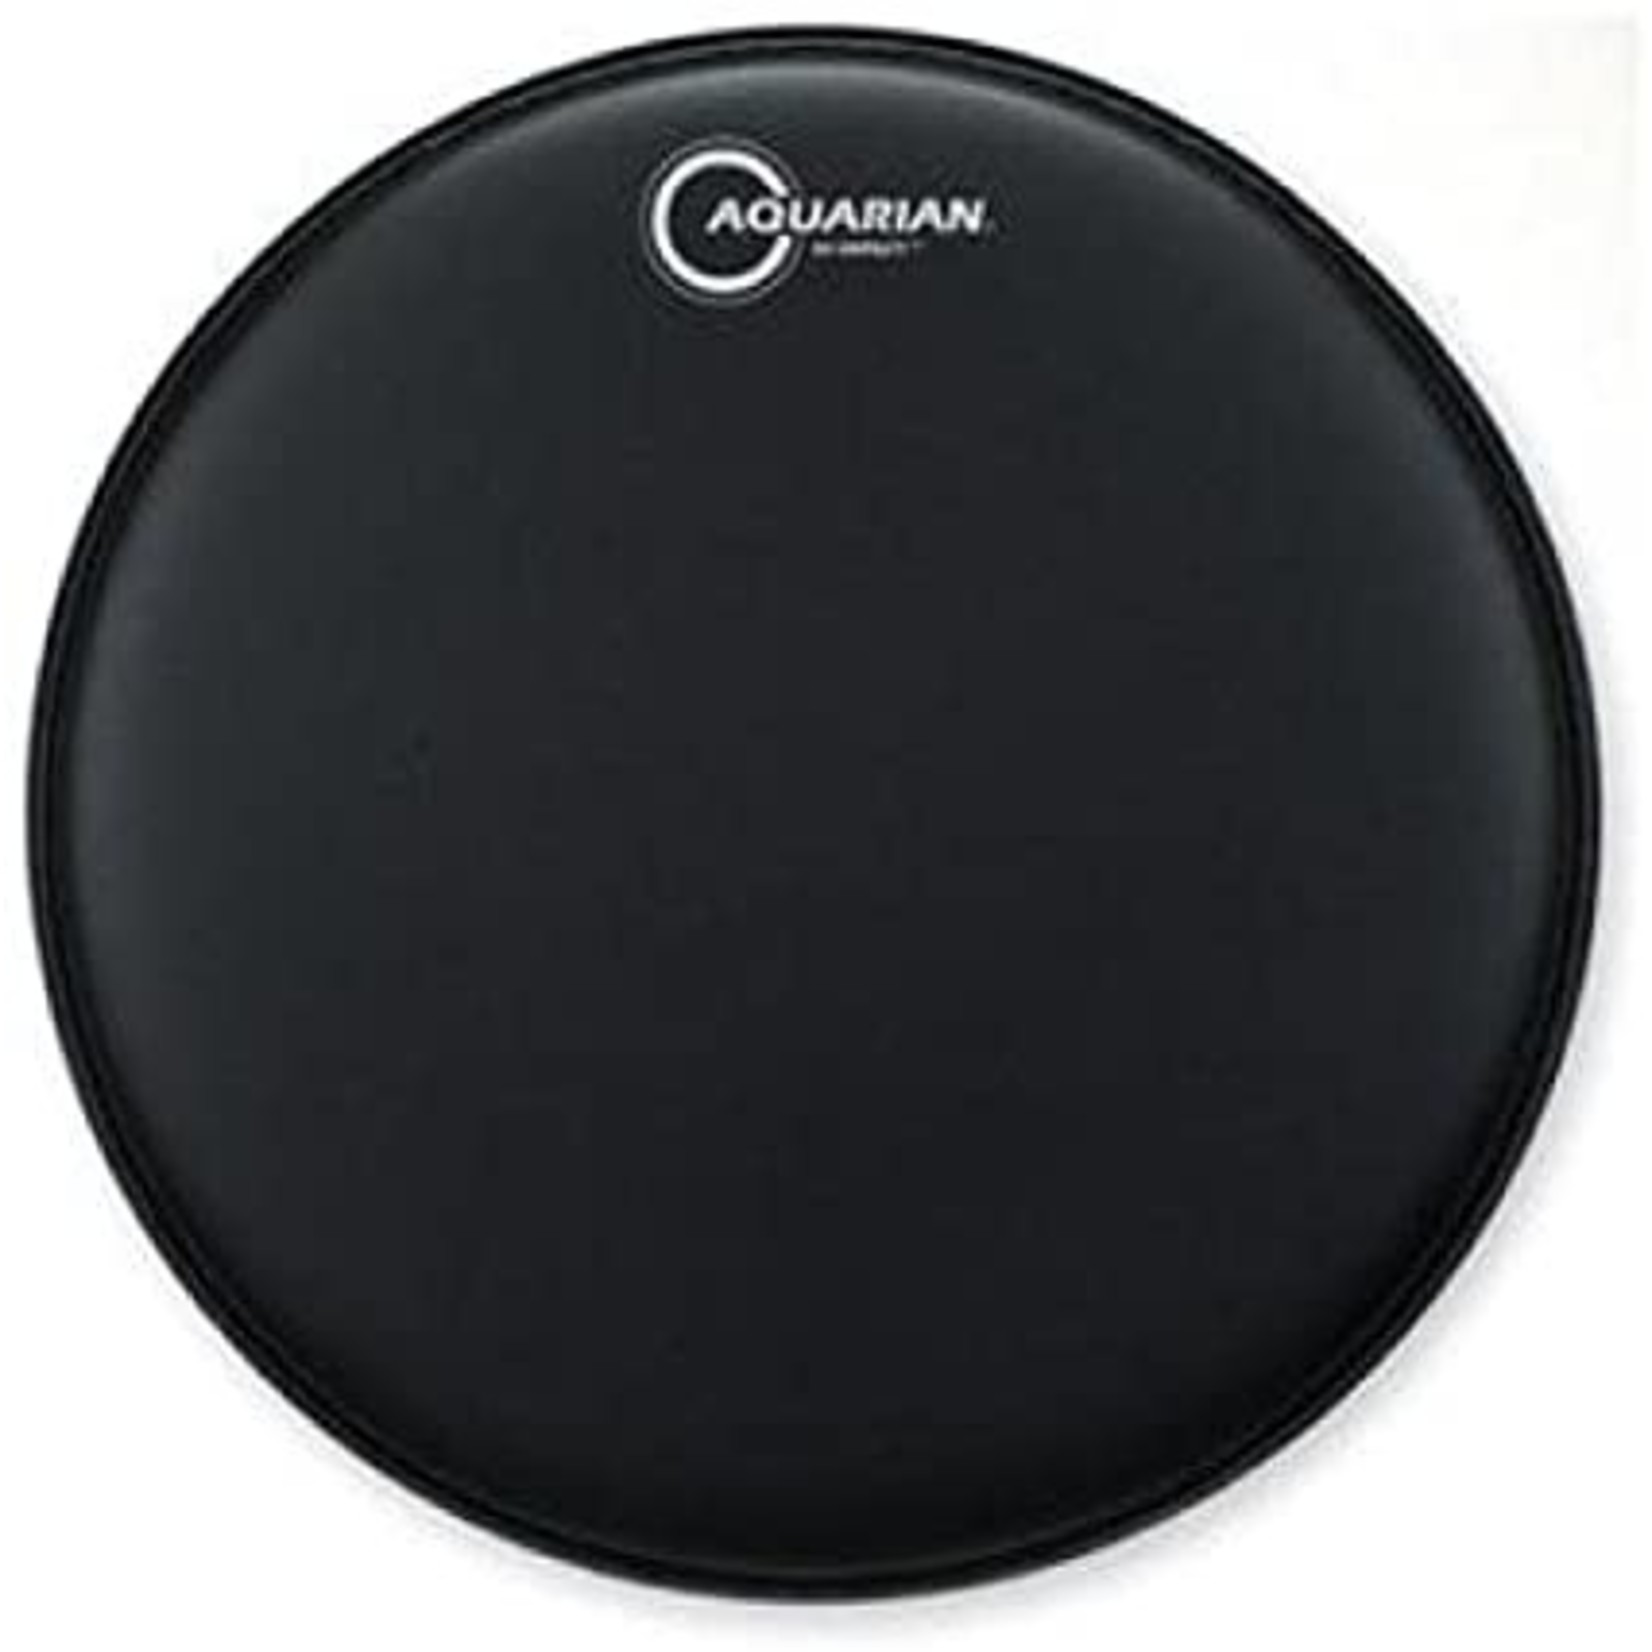 Aquarian Aquarian Hi-Impact Black Texture Coated Heavy w/ Reverse Power Dot